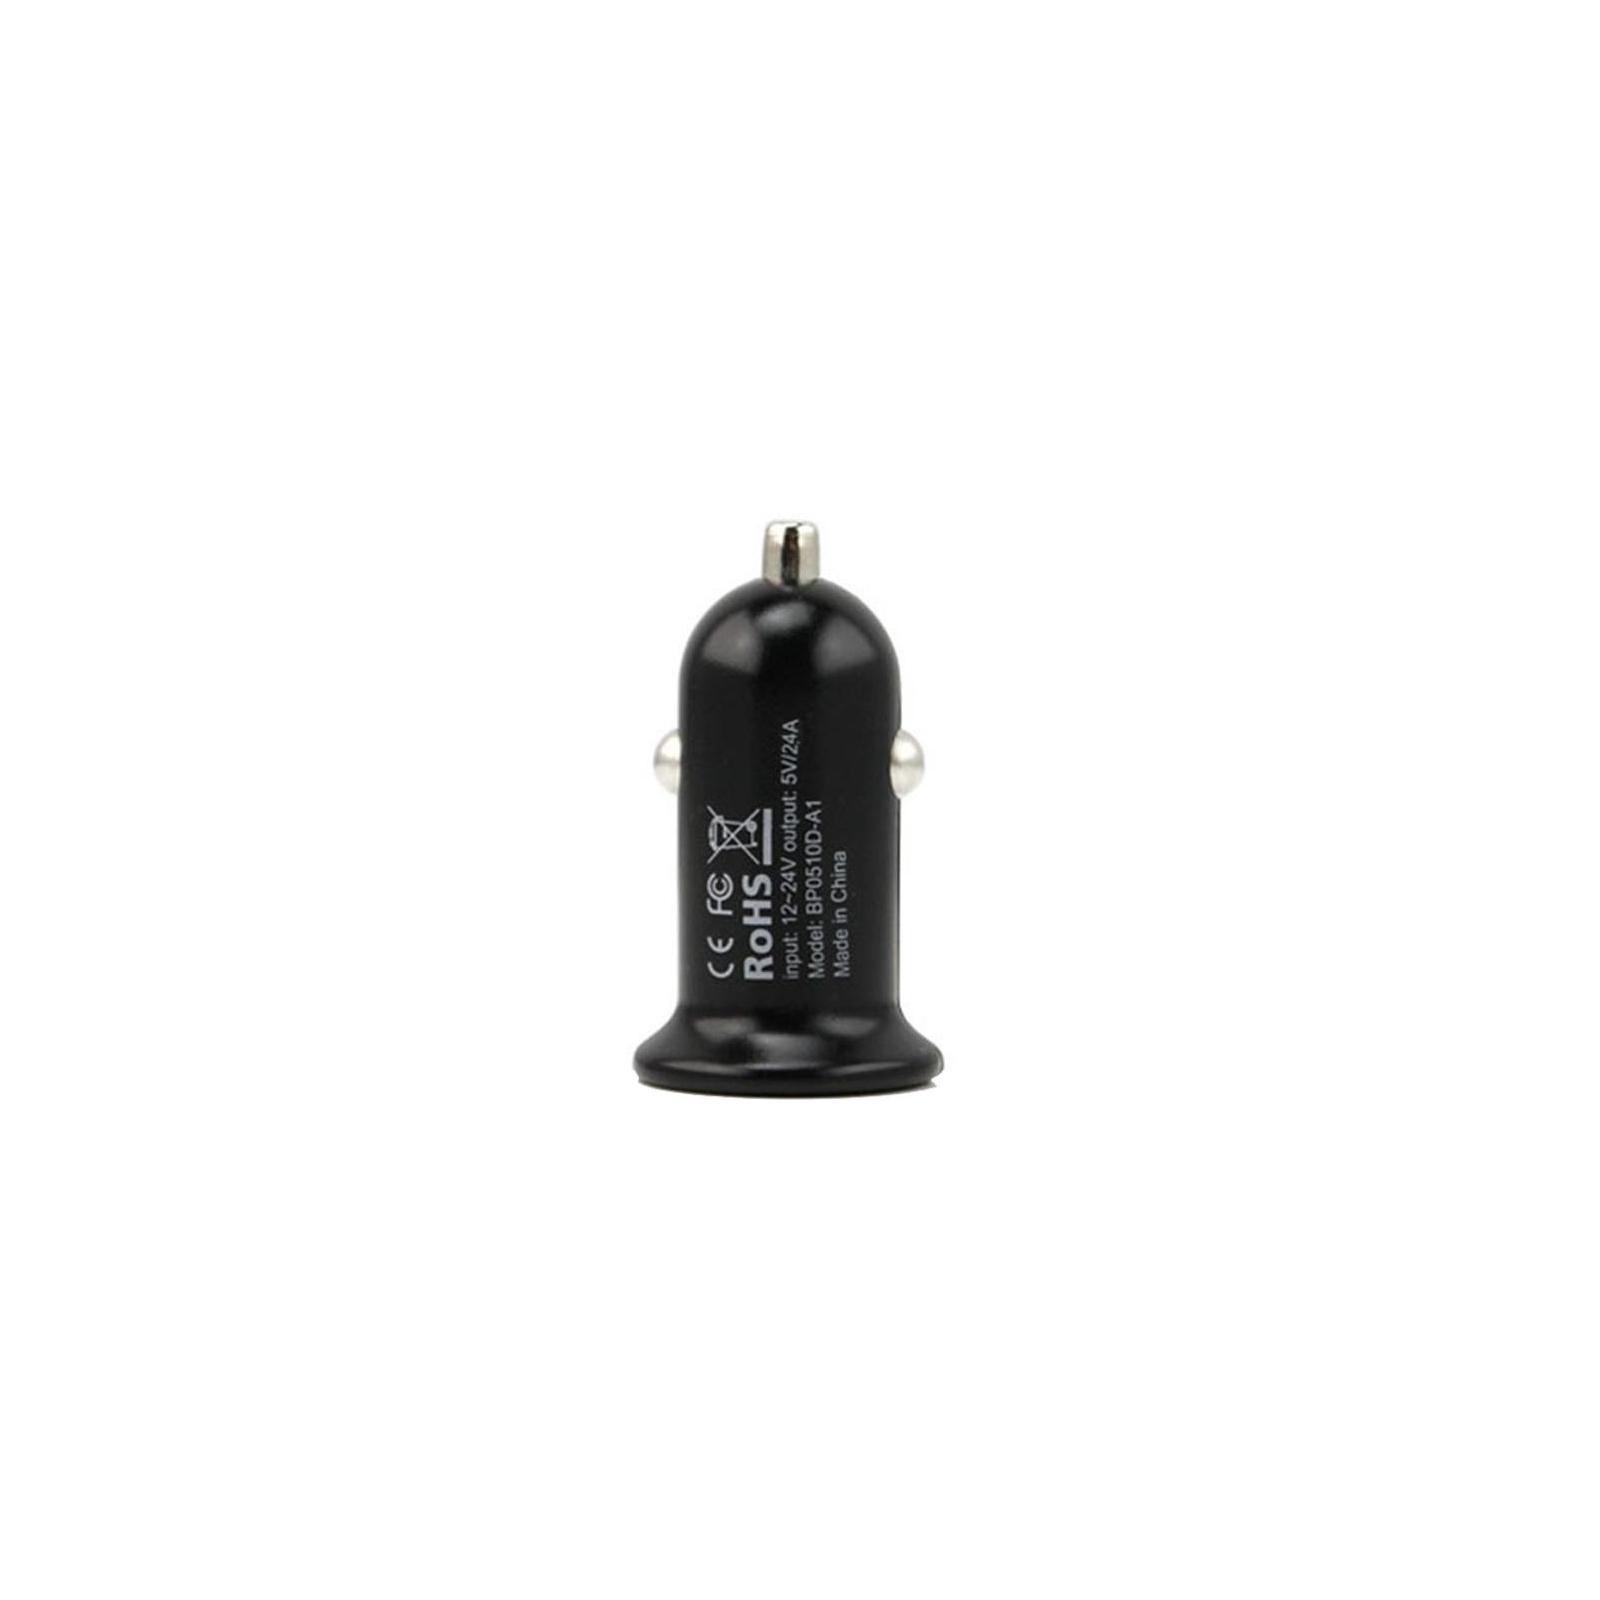 Зарядное устройство JCPAL Star 1*USB, 2.4A (JCP6005) изображение 4